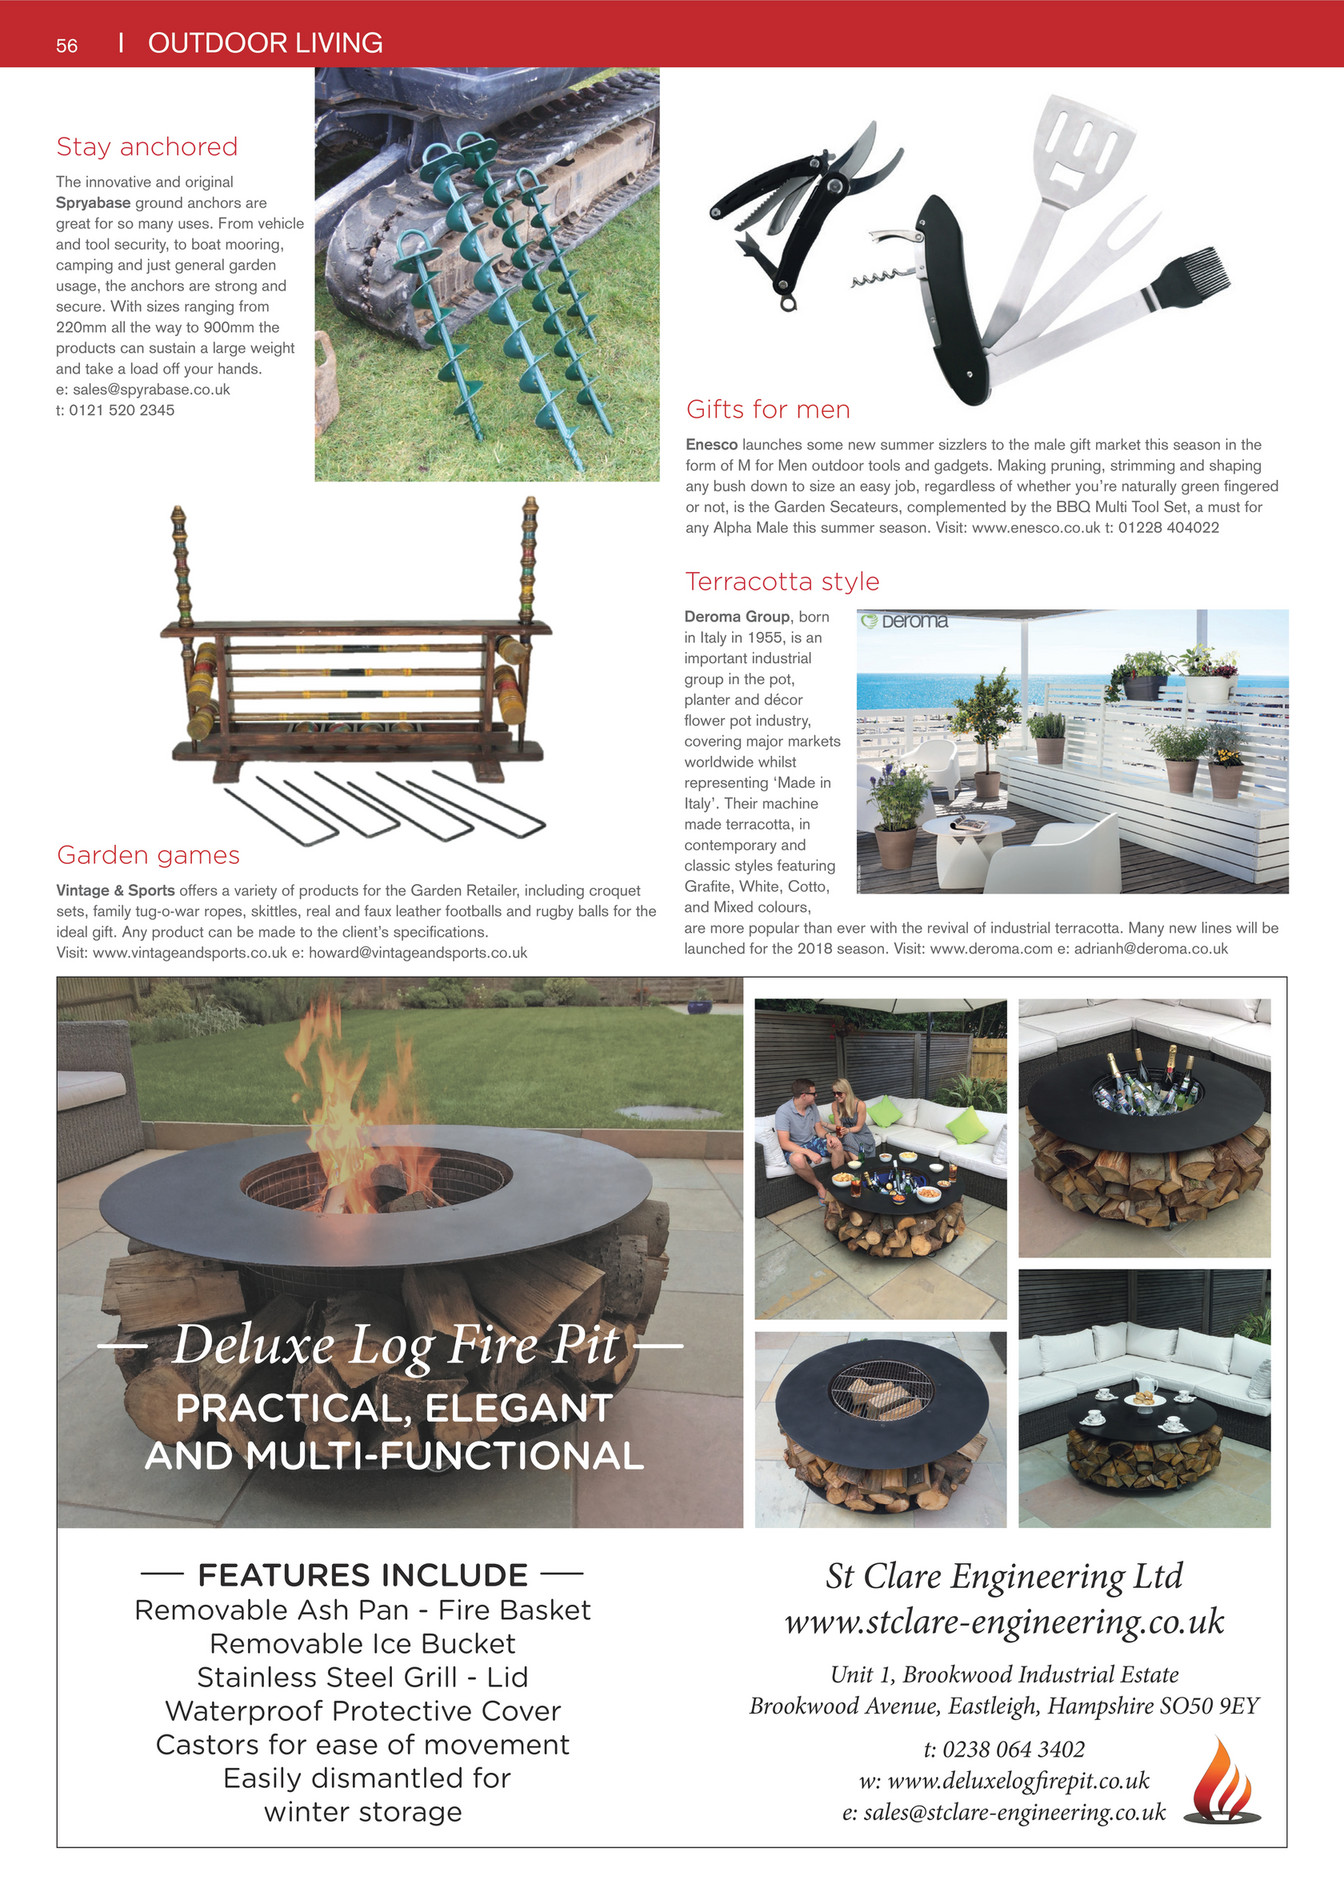 detail extra ltd - garden centre buyer june/july 2017 - page 56-57